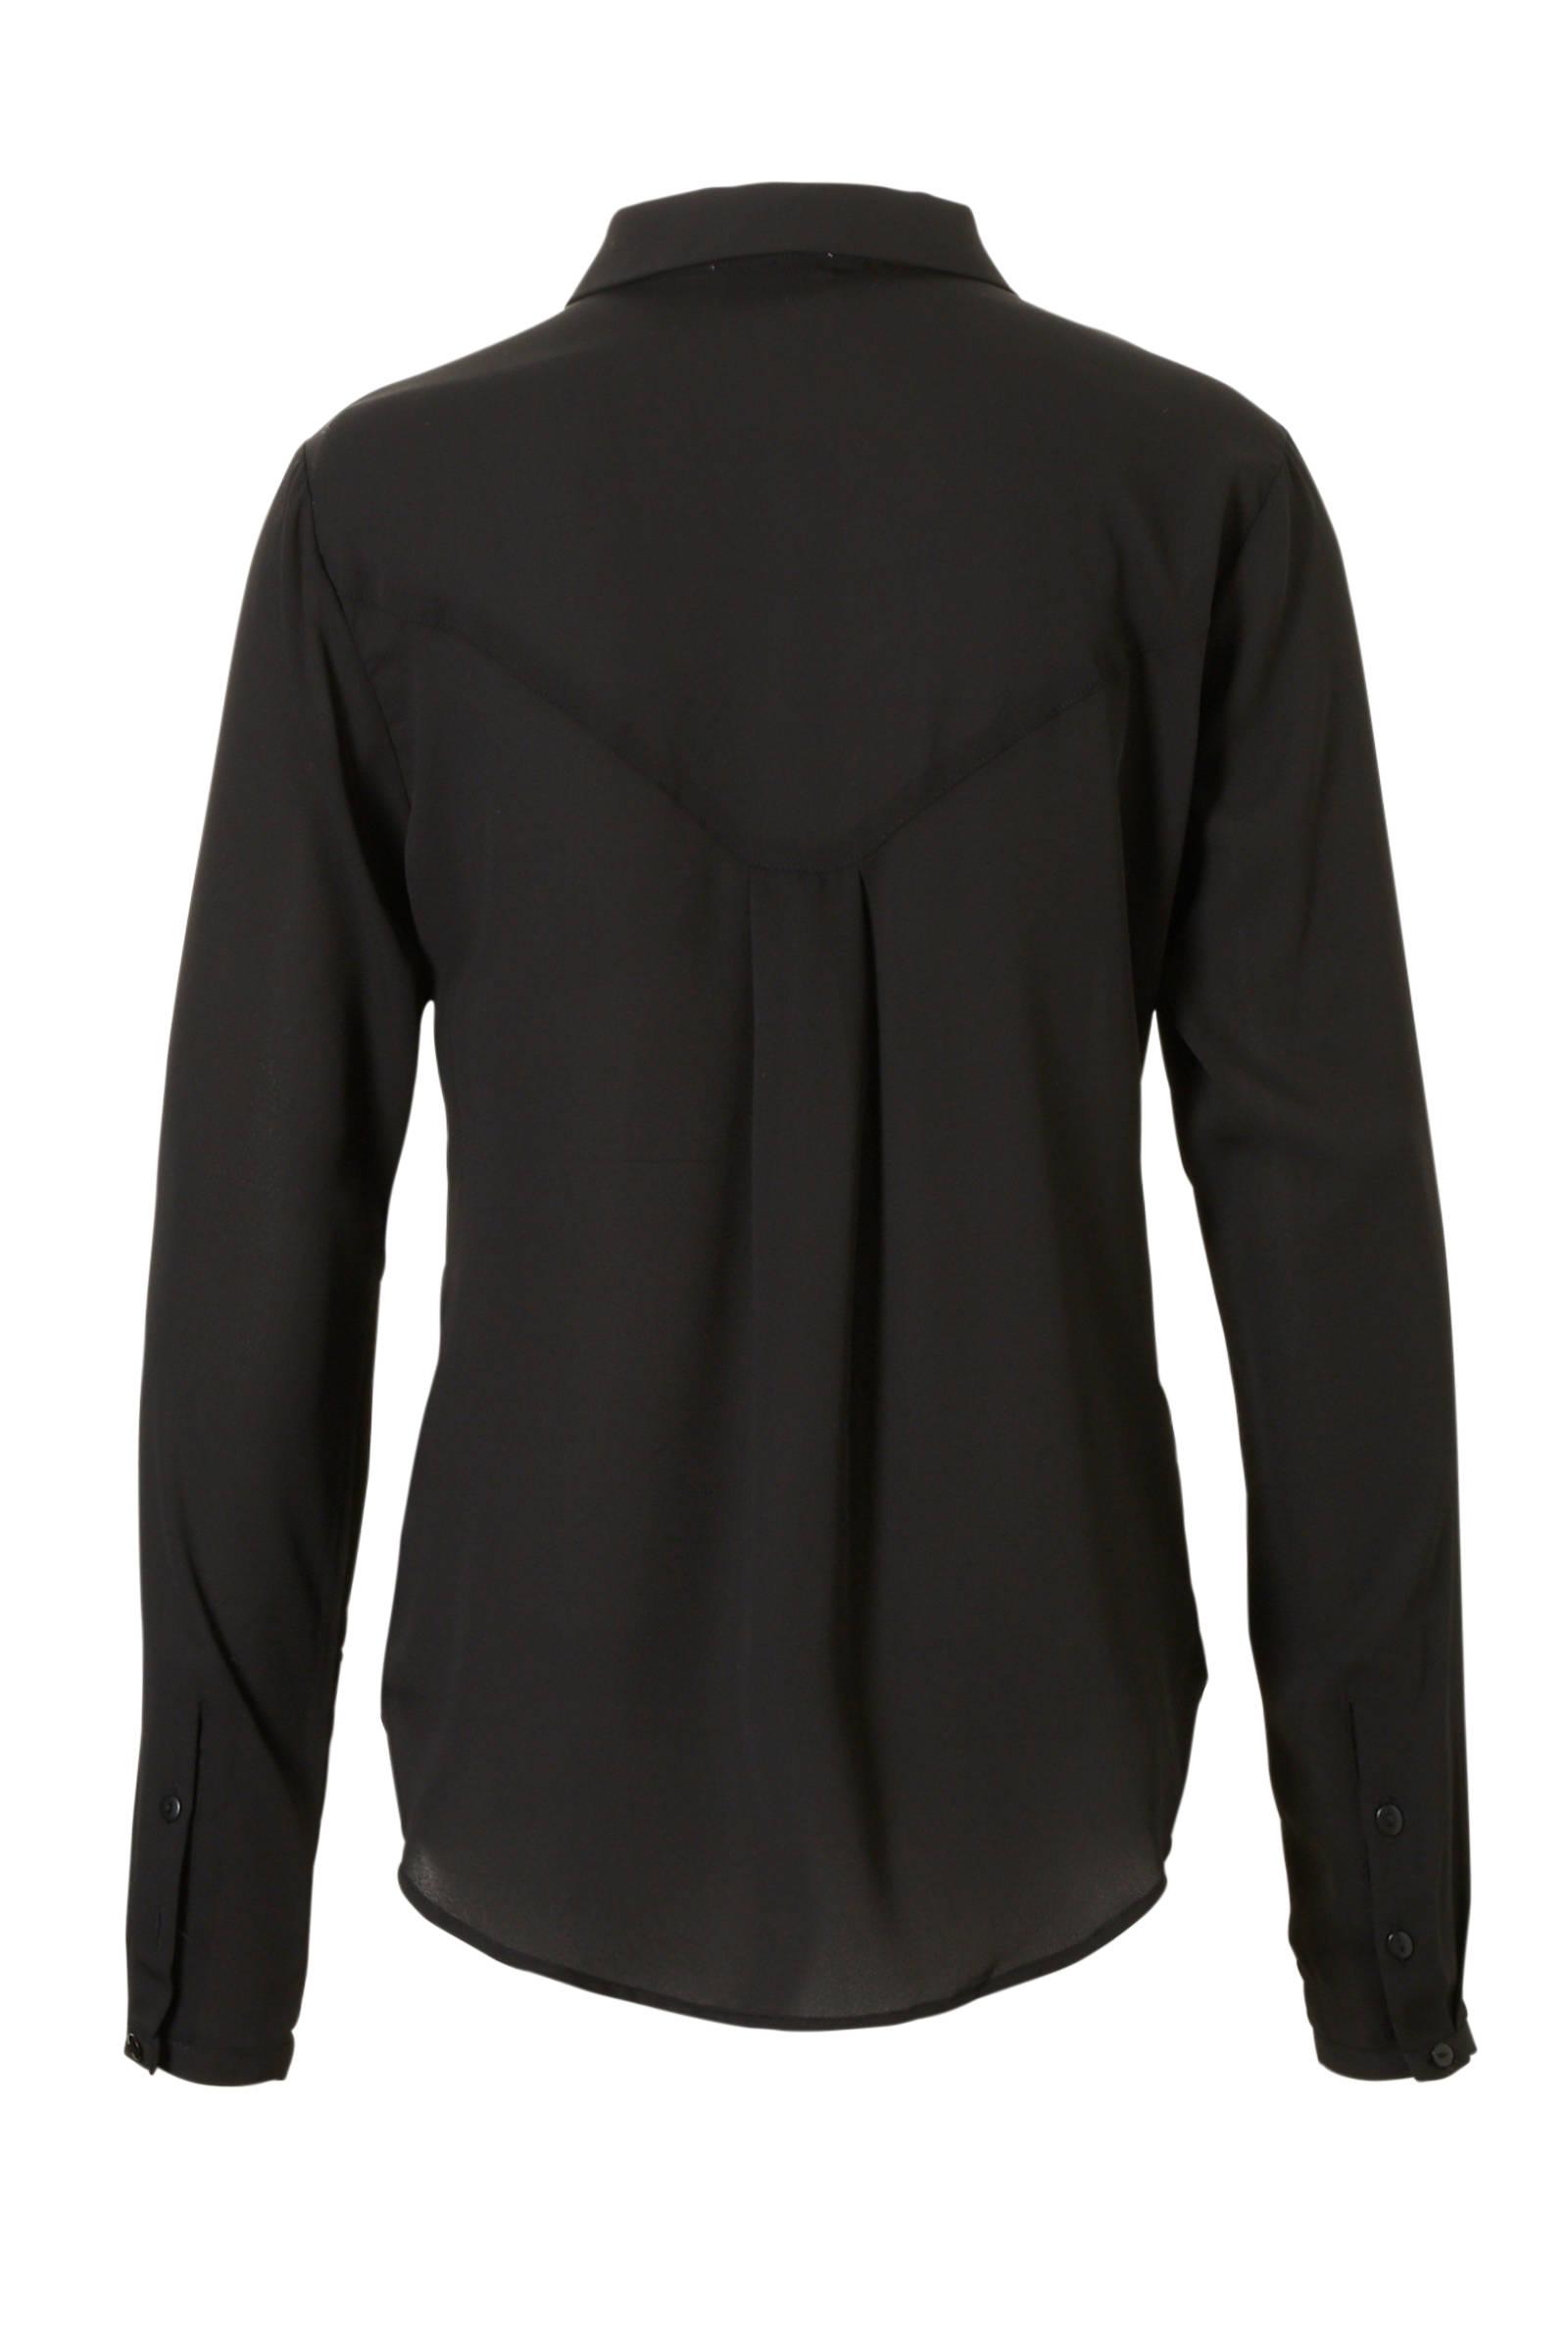 modström modström modström modström blouse blouse blouse modström blouse T7f8qa